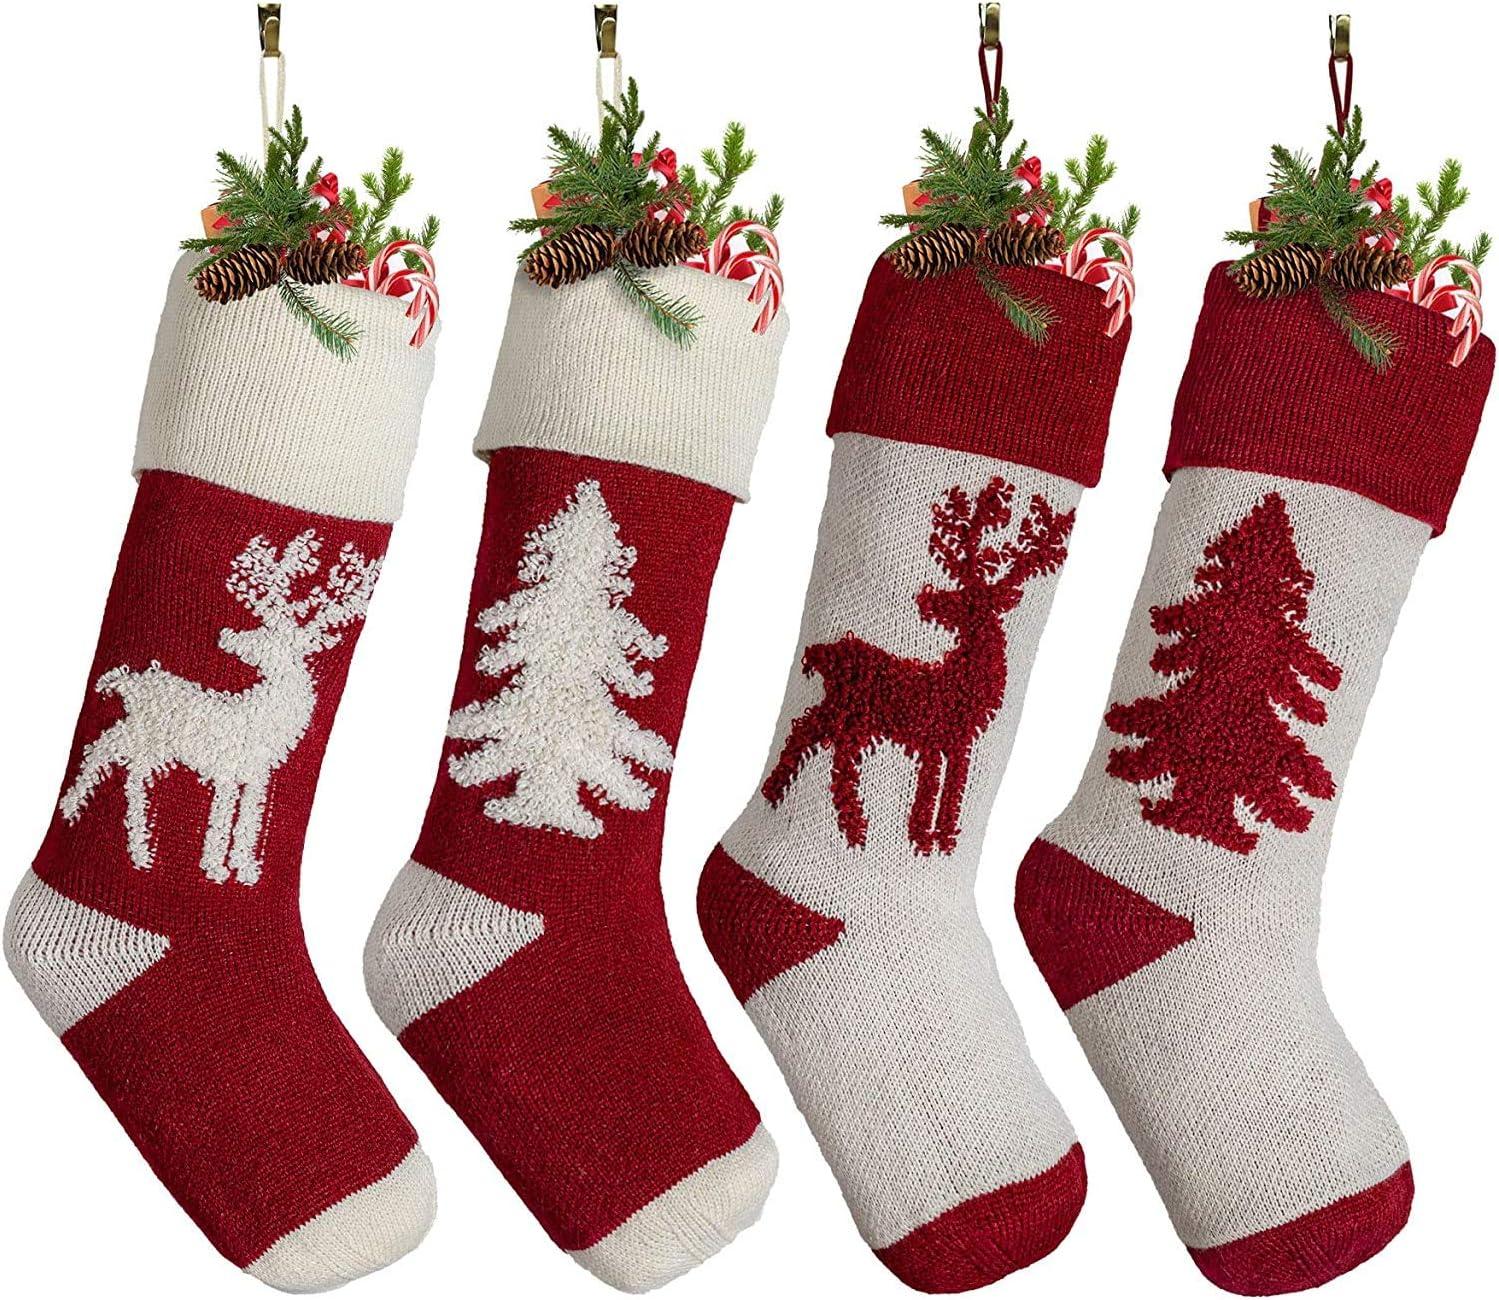 Max 76% OFF Yuokwer Set of 4 Big Size Stockings shopping 18-Inch Christmas Extra Lon